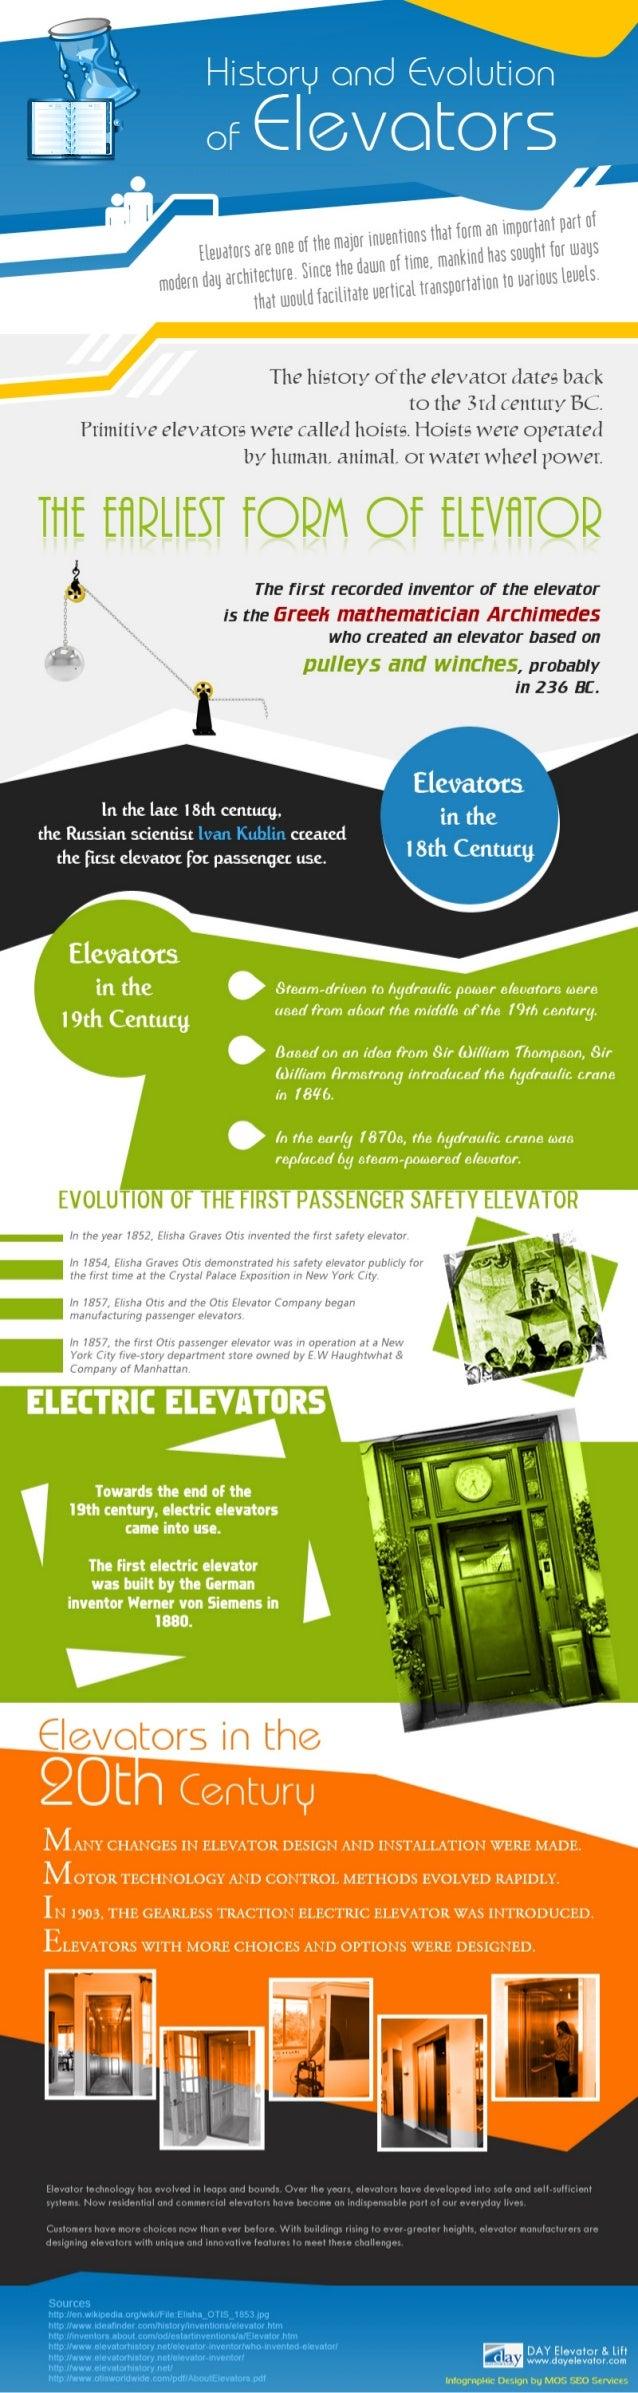 History and evolution of elevators